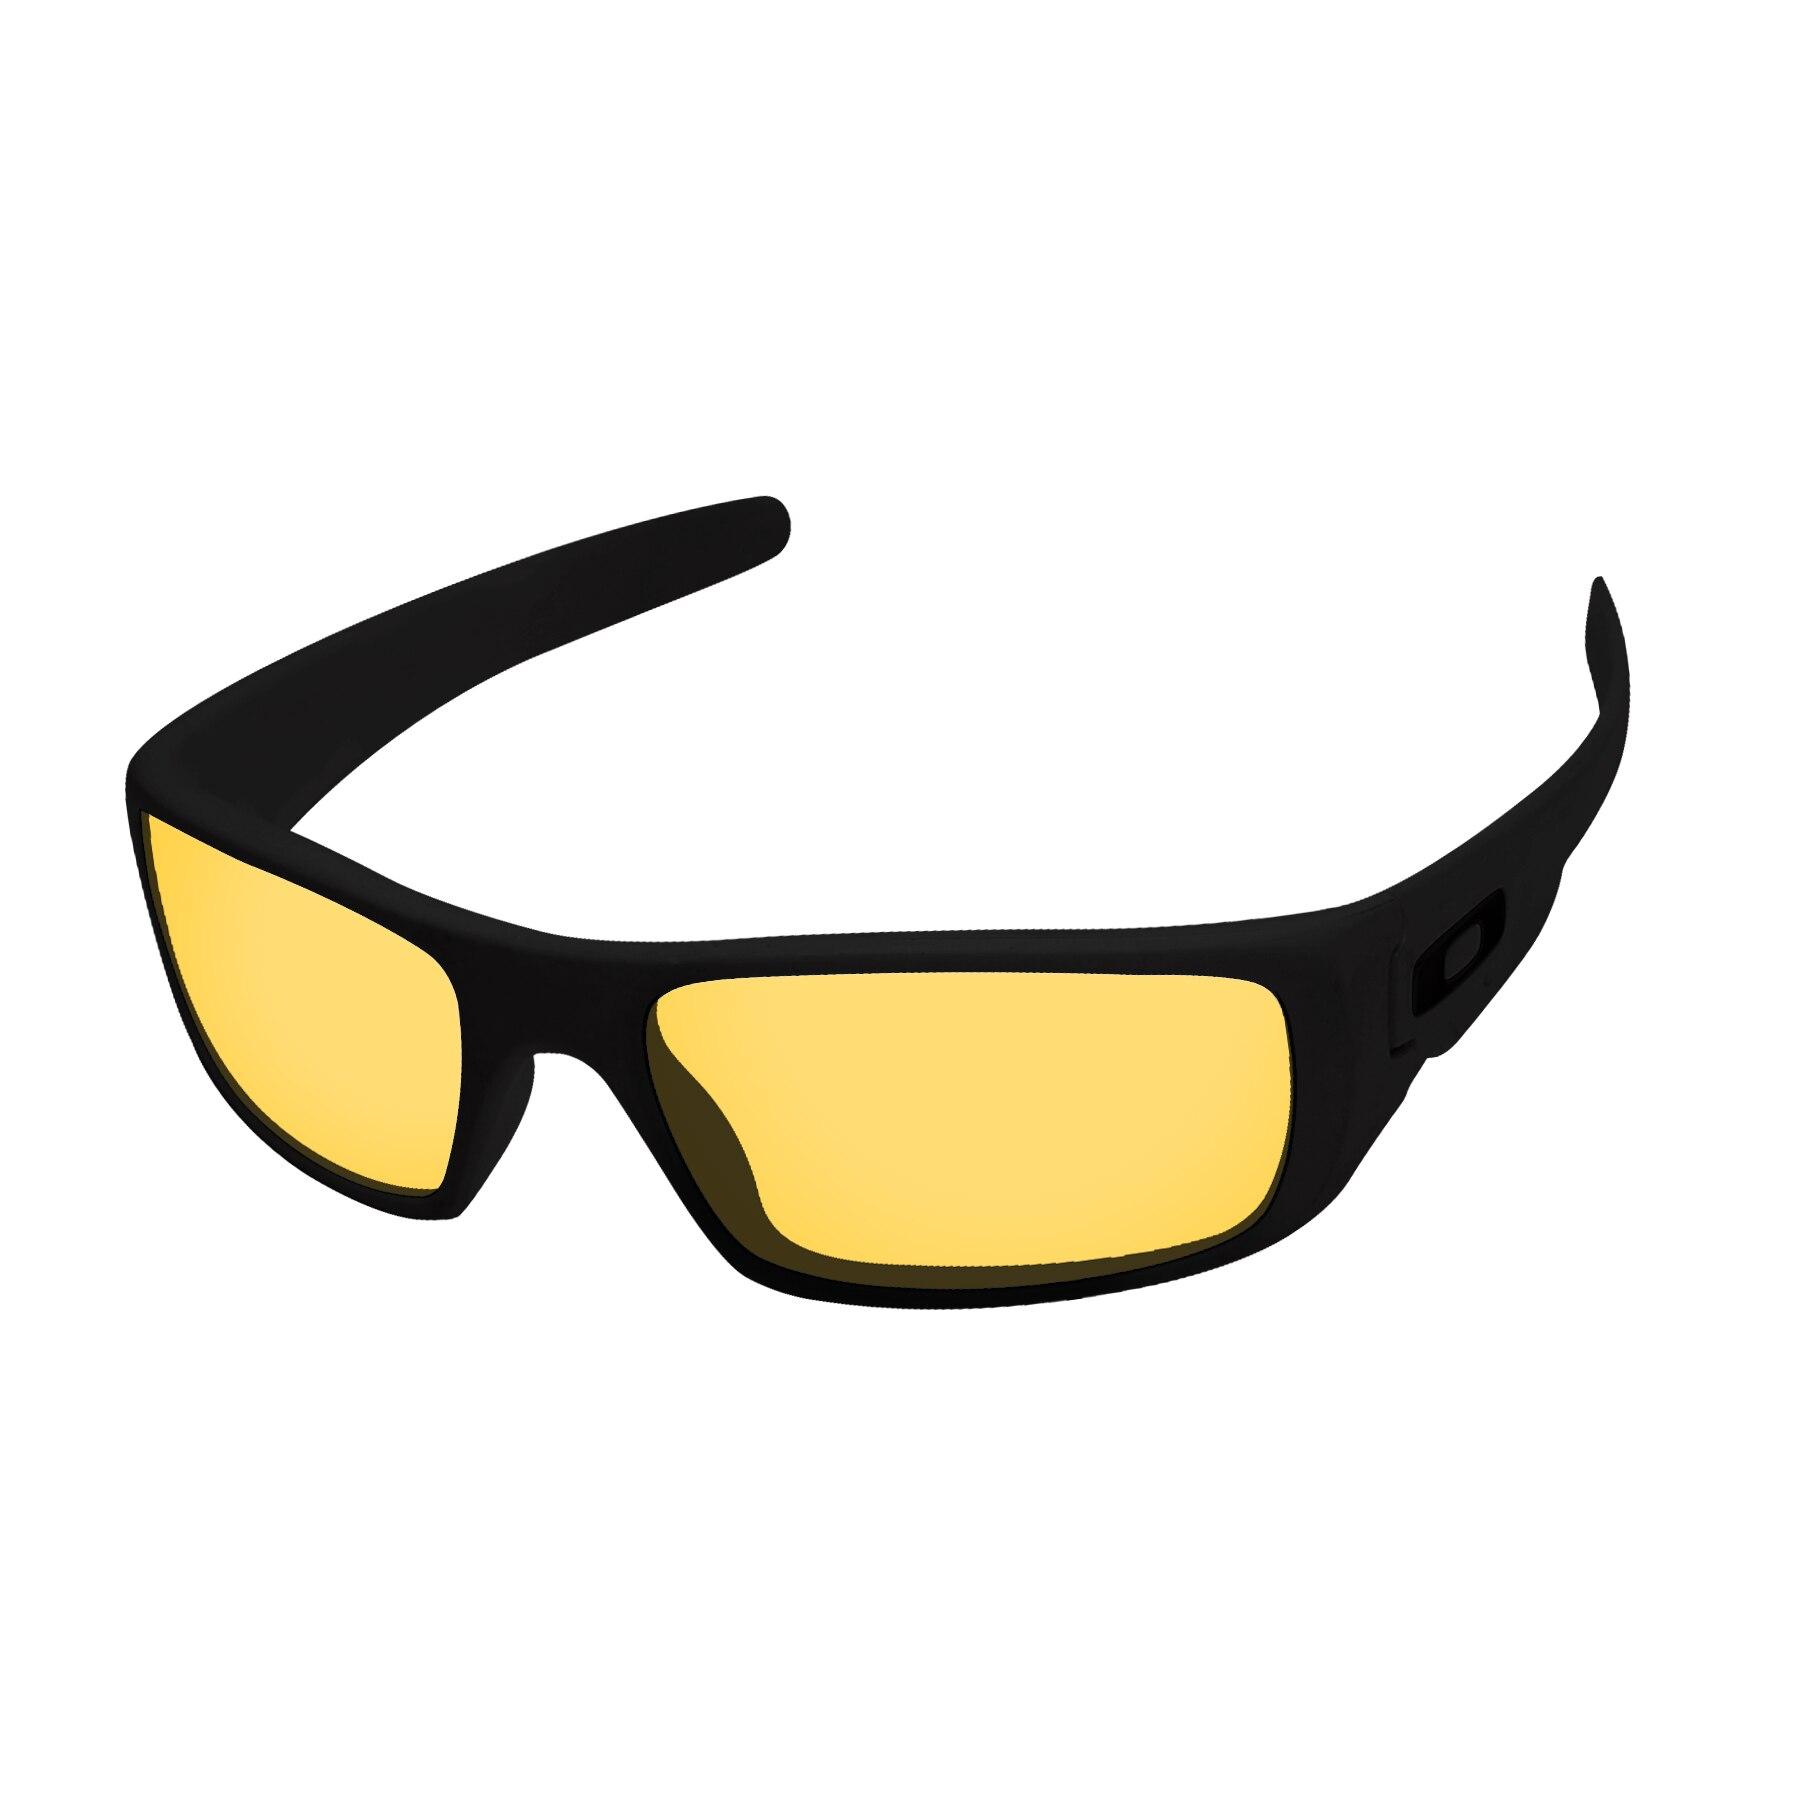 Papaviva Crystal Yellow Replacement Lenses For Crankshaft Sunglasses Frame 100% UVA & UVB Protection